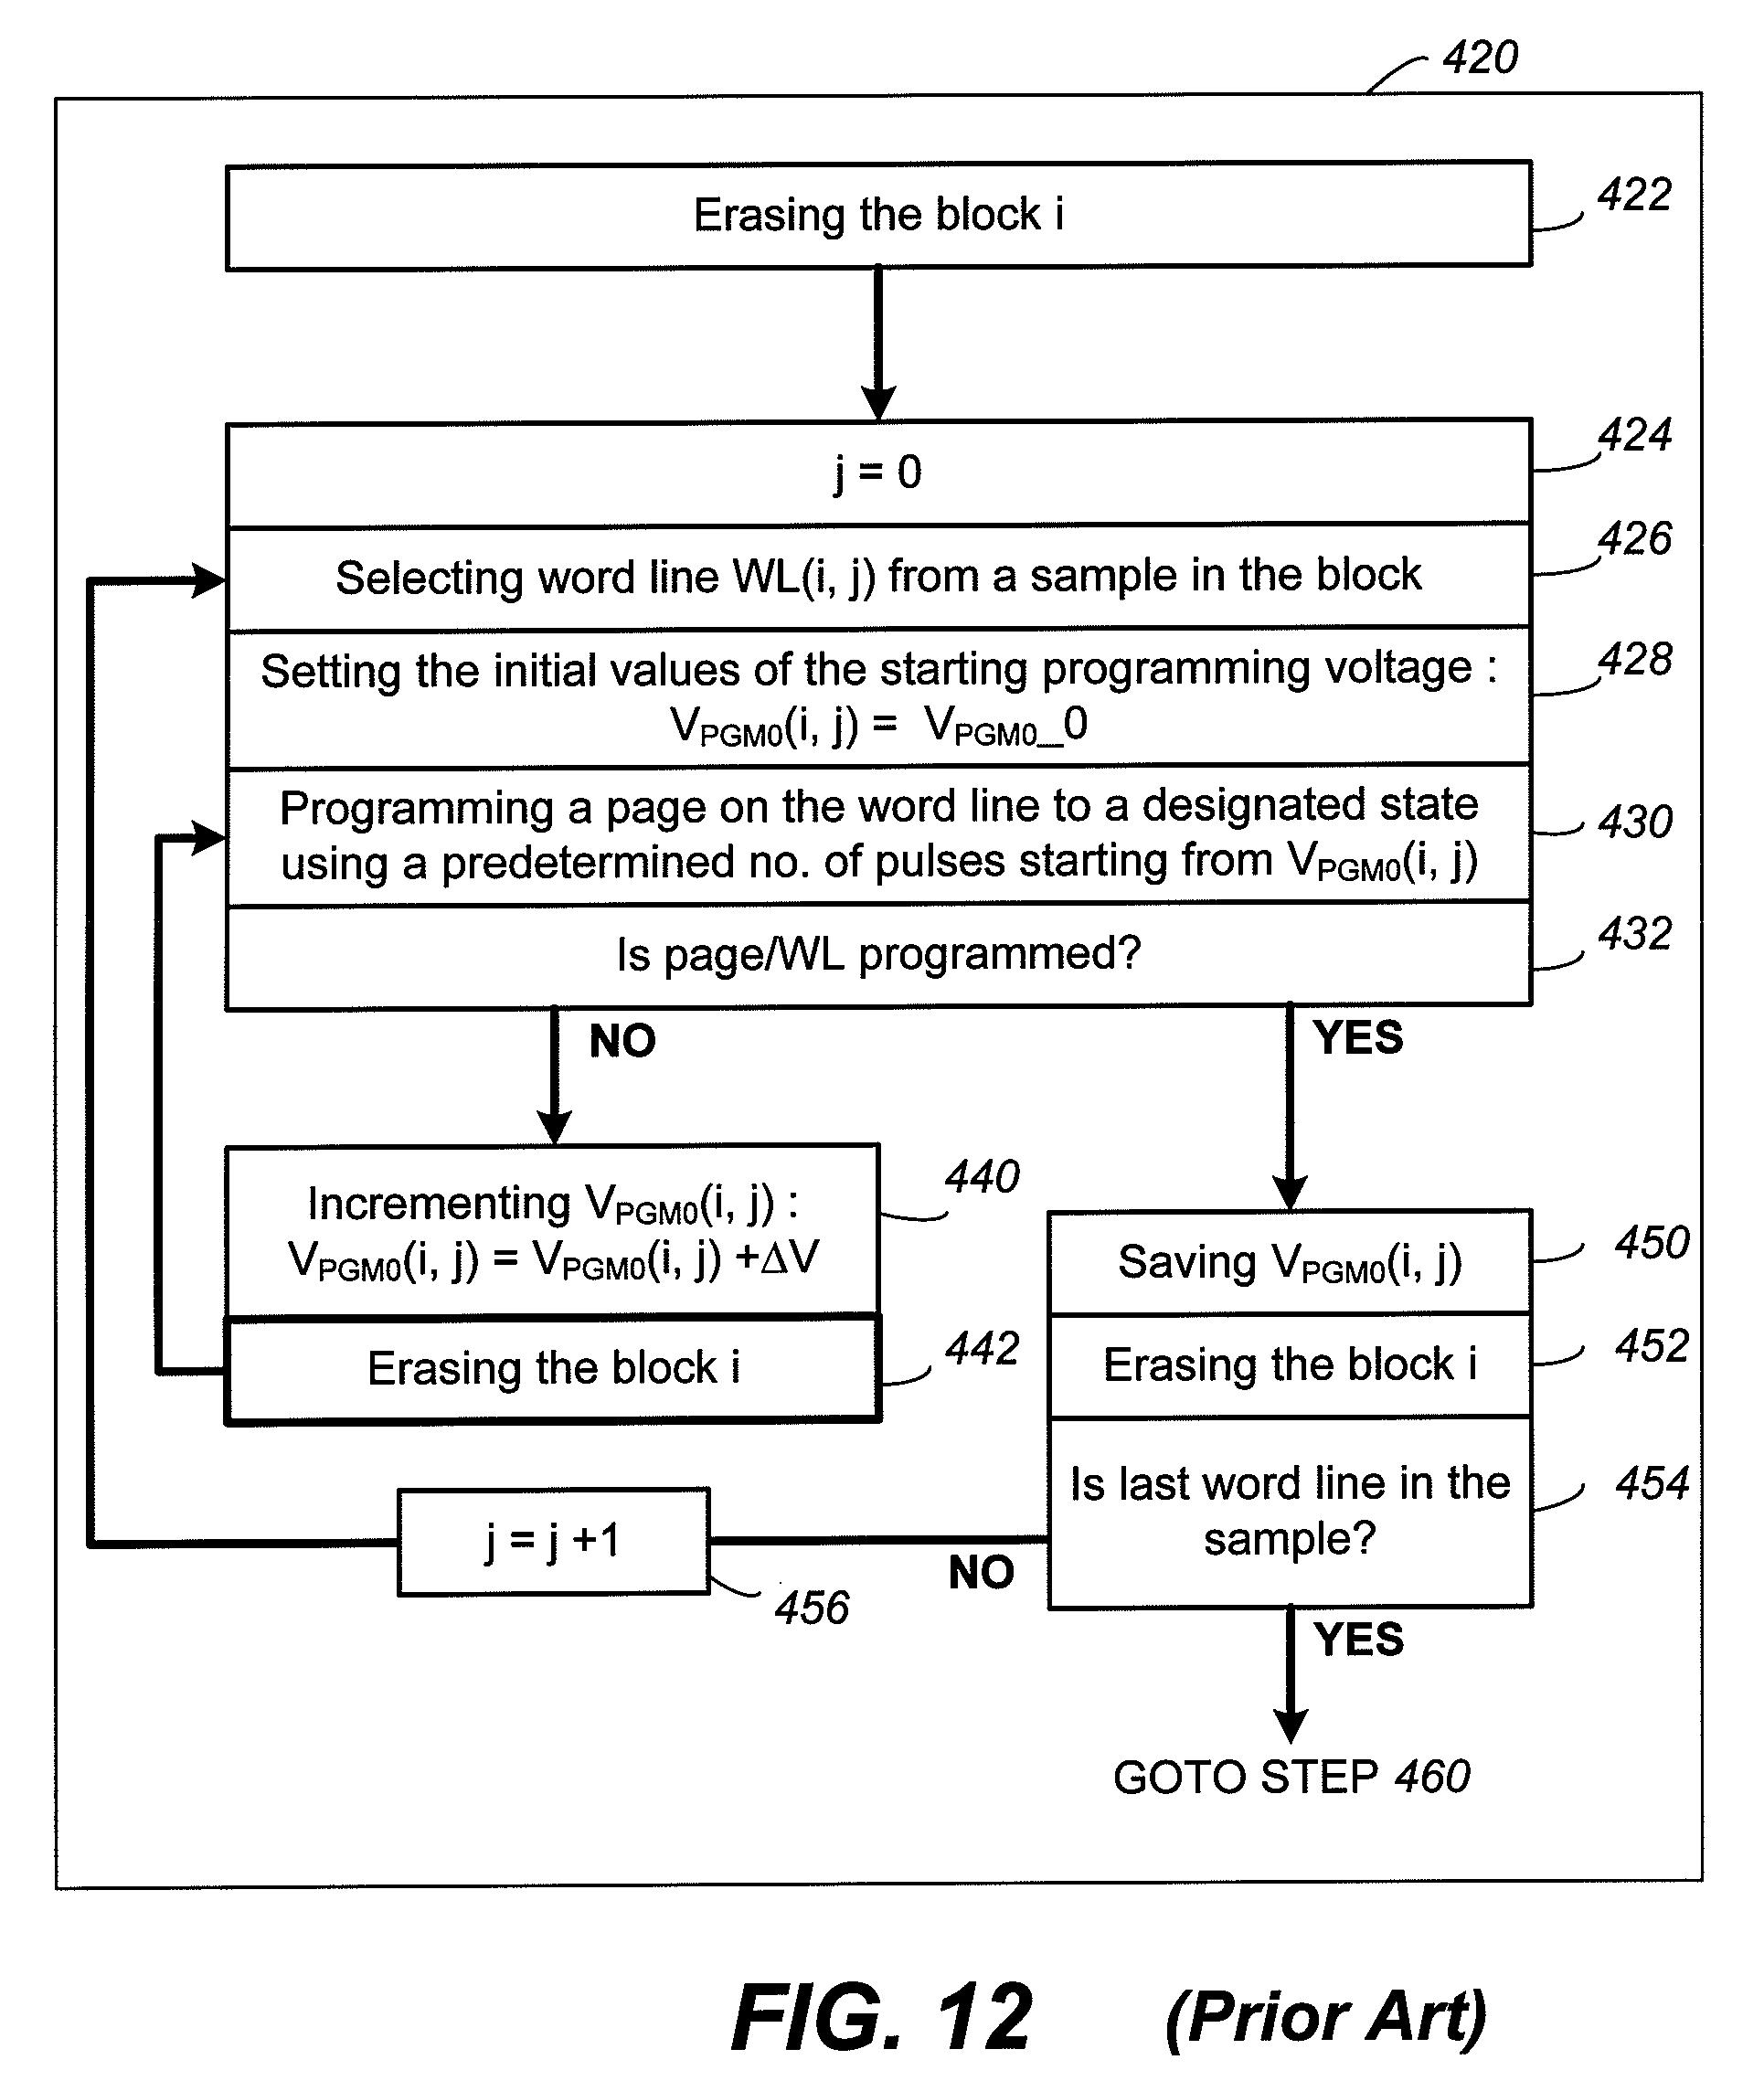 Brevet US Method for non volatile memory with